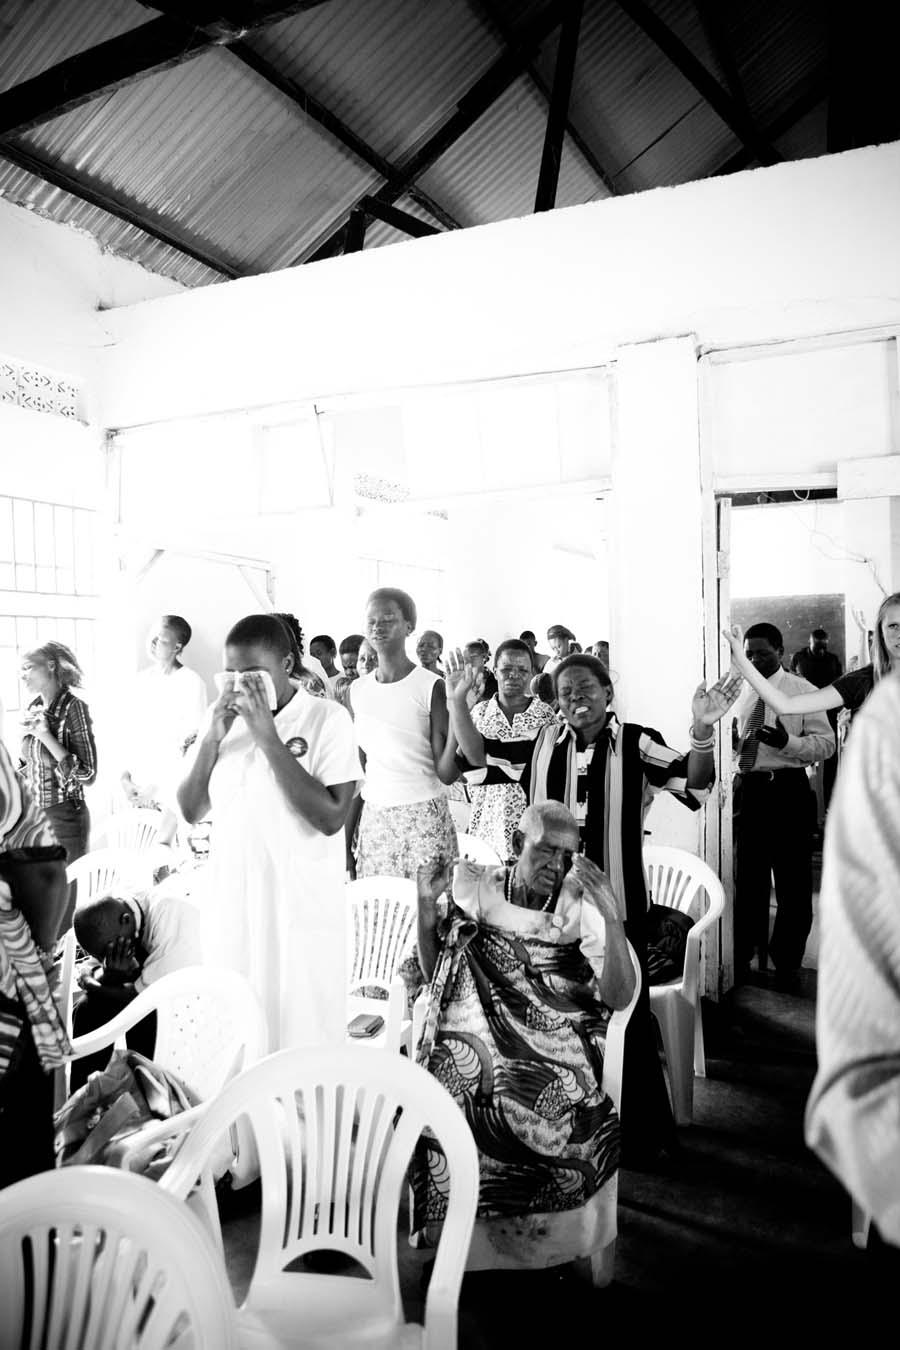 jessicadavisphotography.com | Jessica Davis Photography | Portrait Work in Uganda| Travel Photographer | World Event Photographs 1 (11).jpg